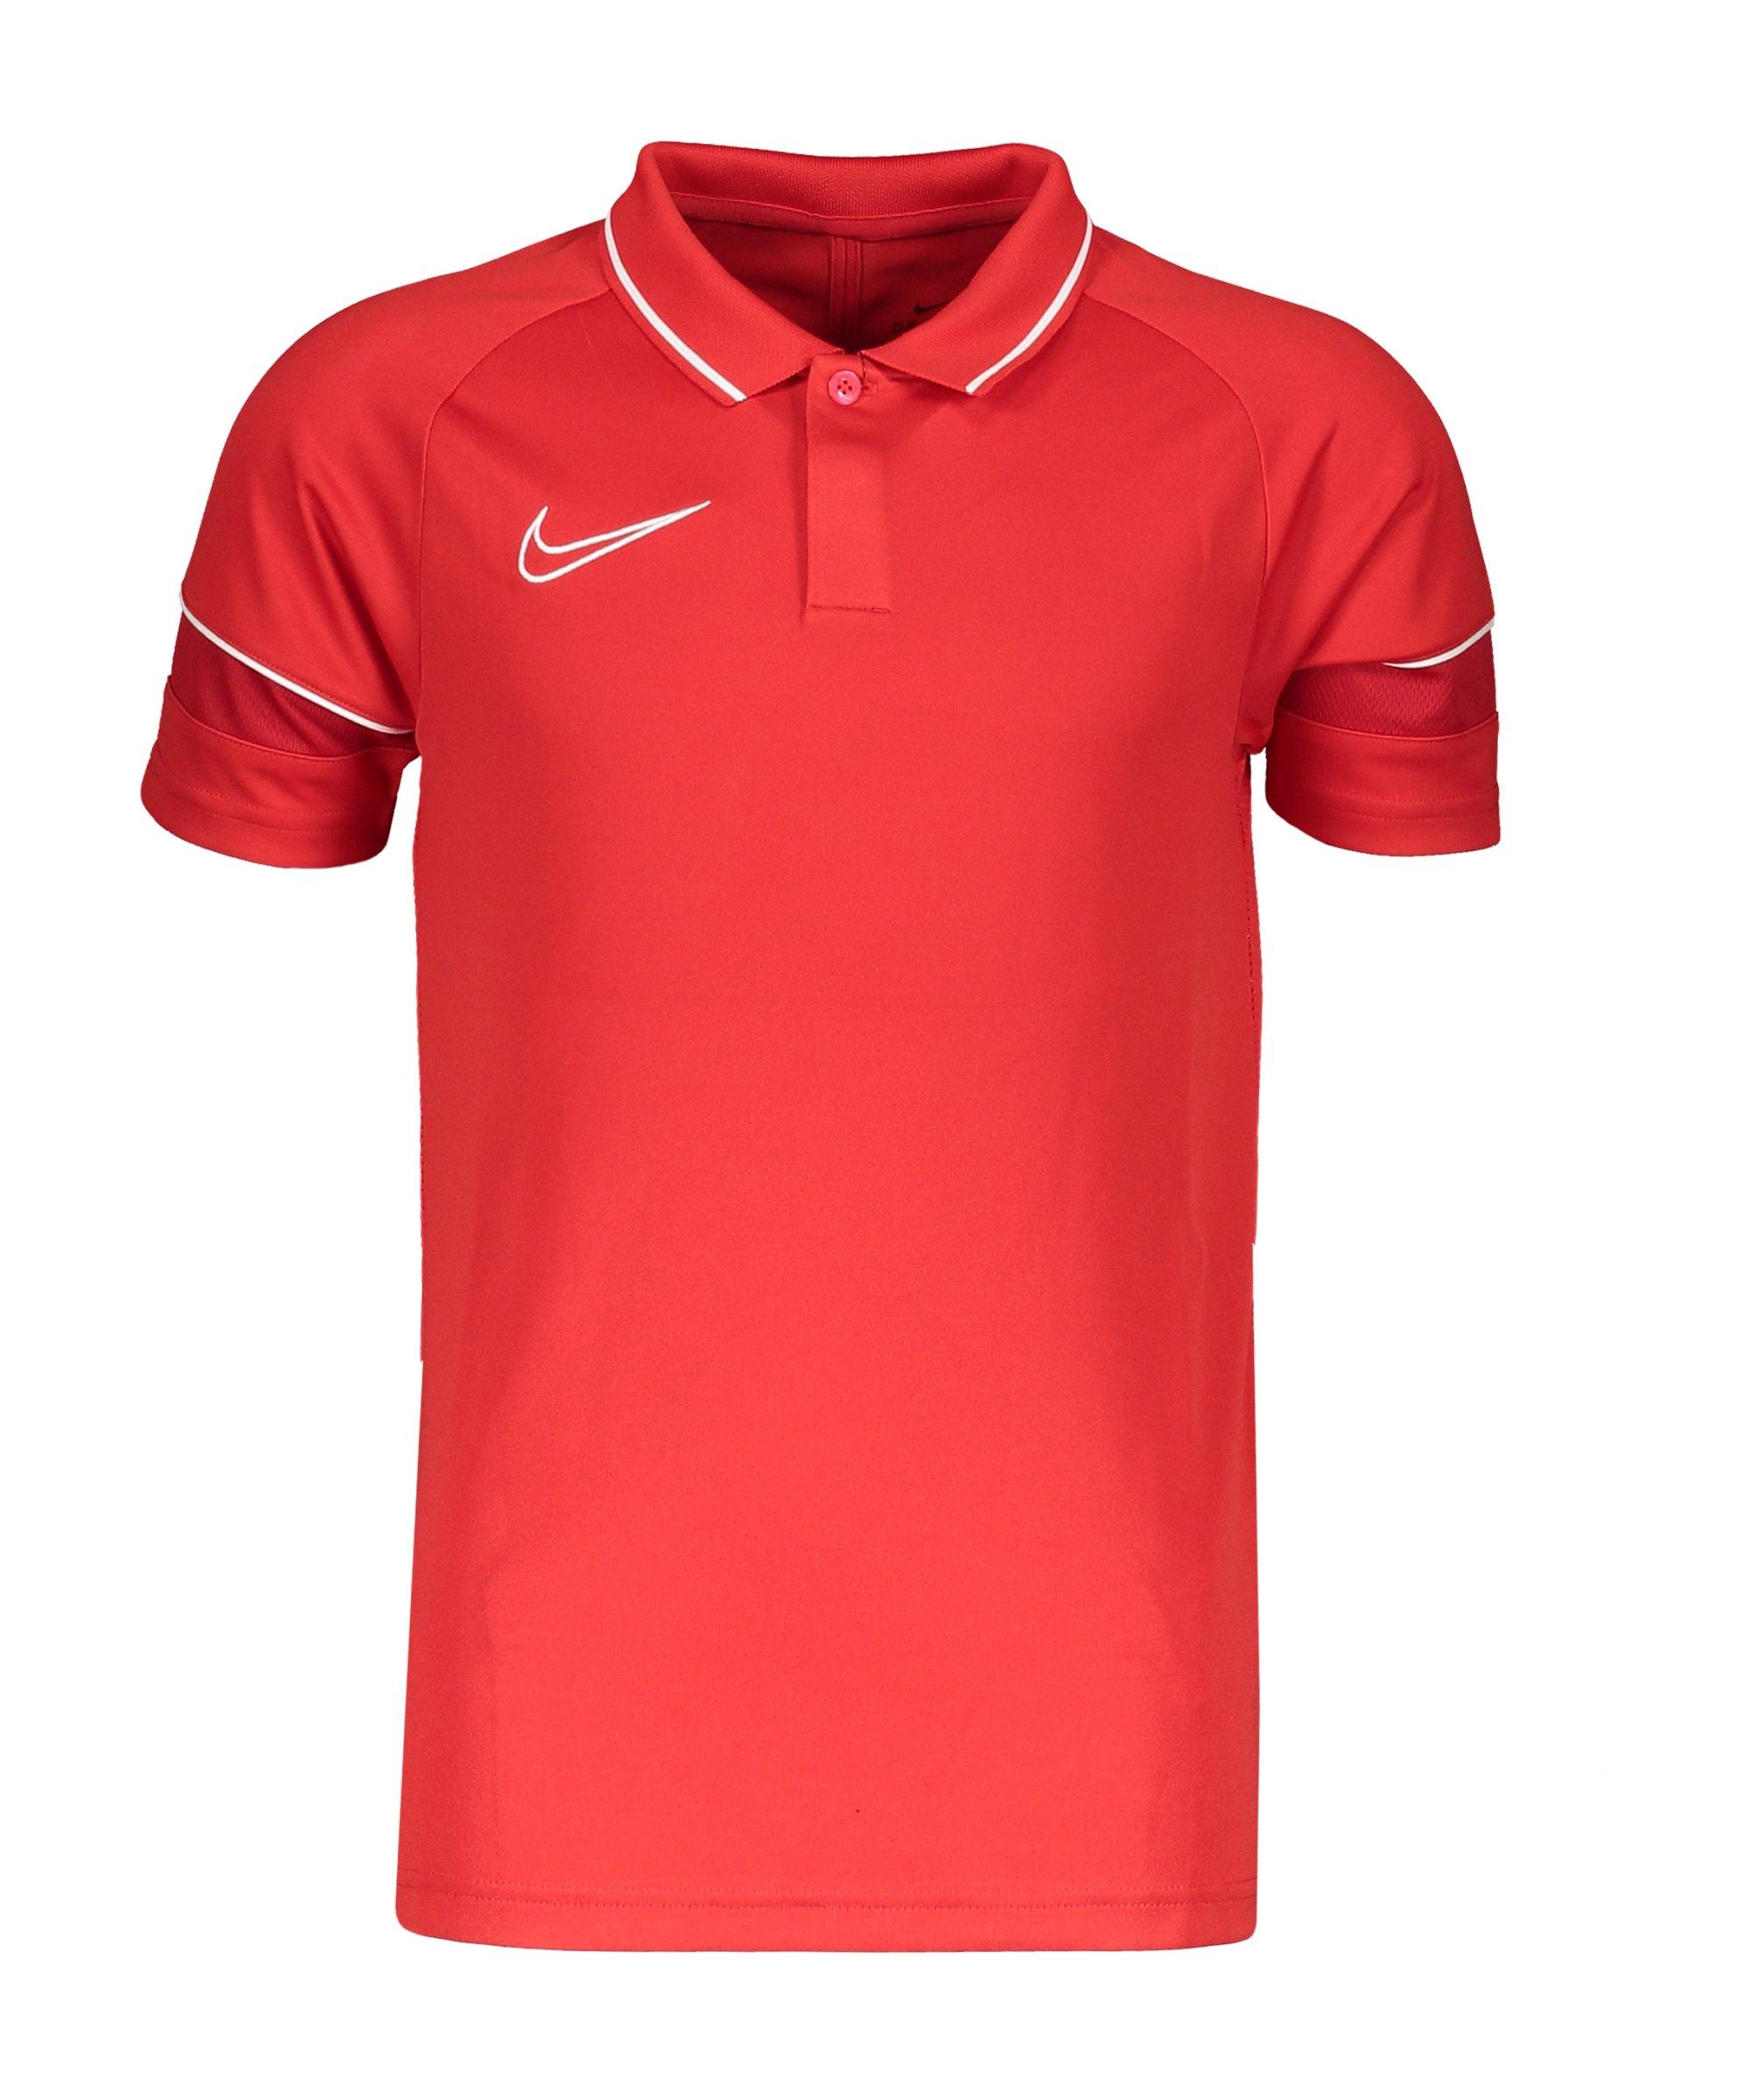 Nike Academy 21 Poloshirt Kids Rot Weiss F657 - rot